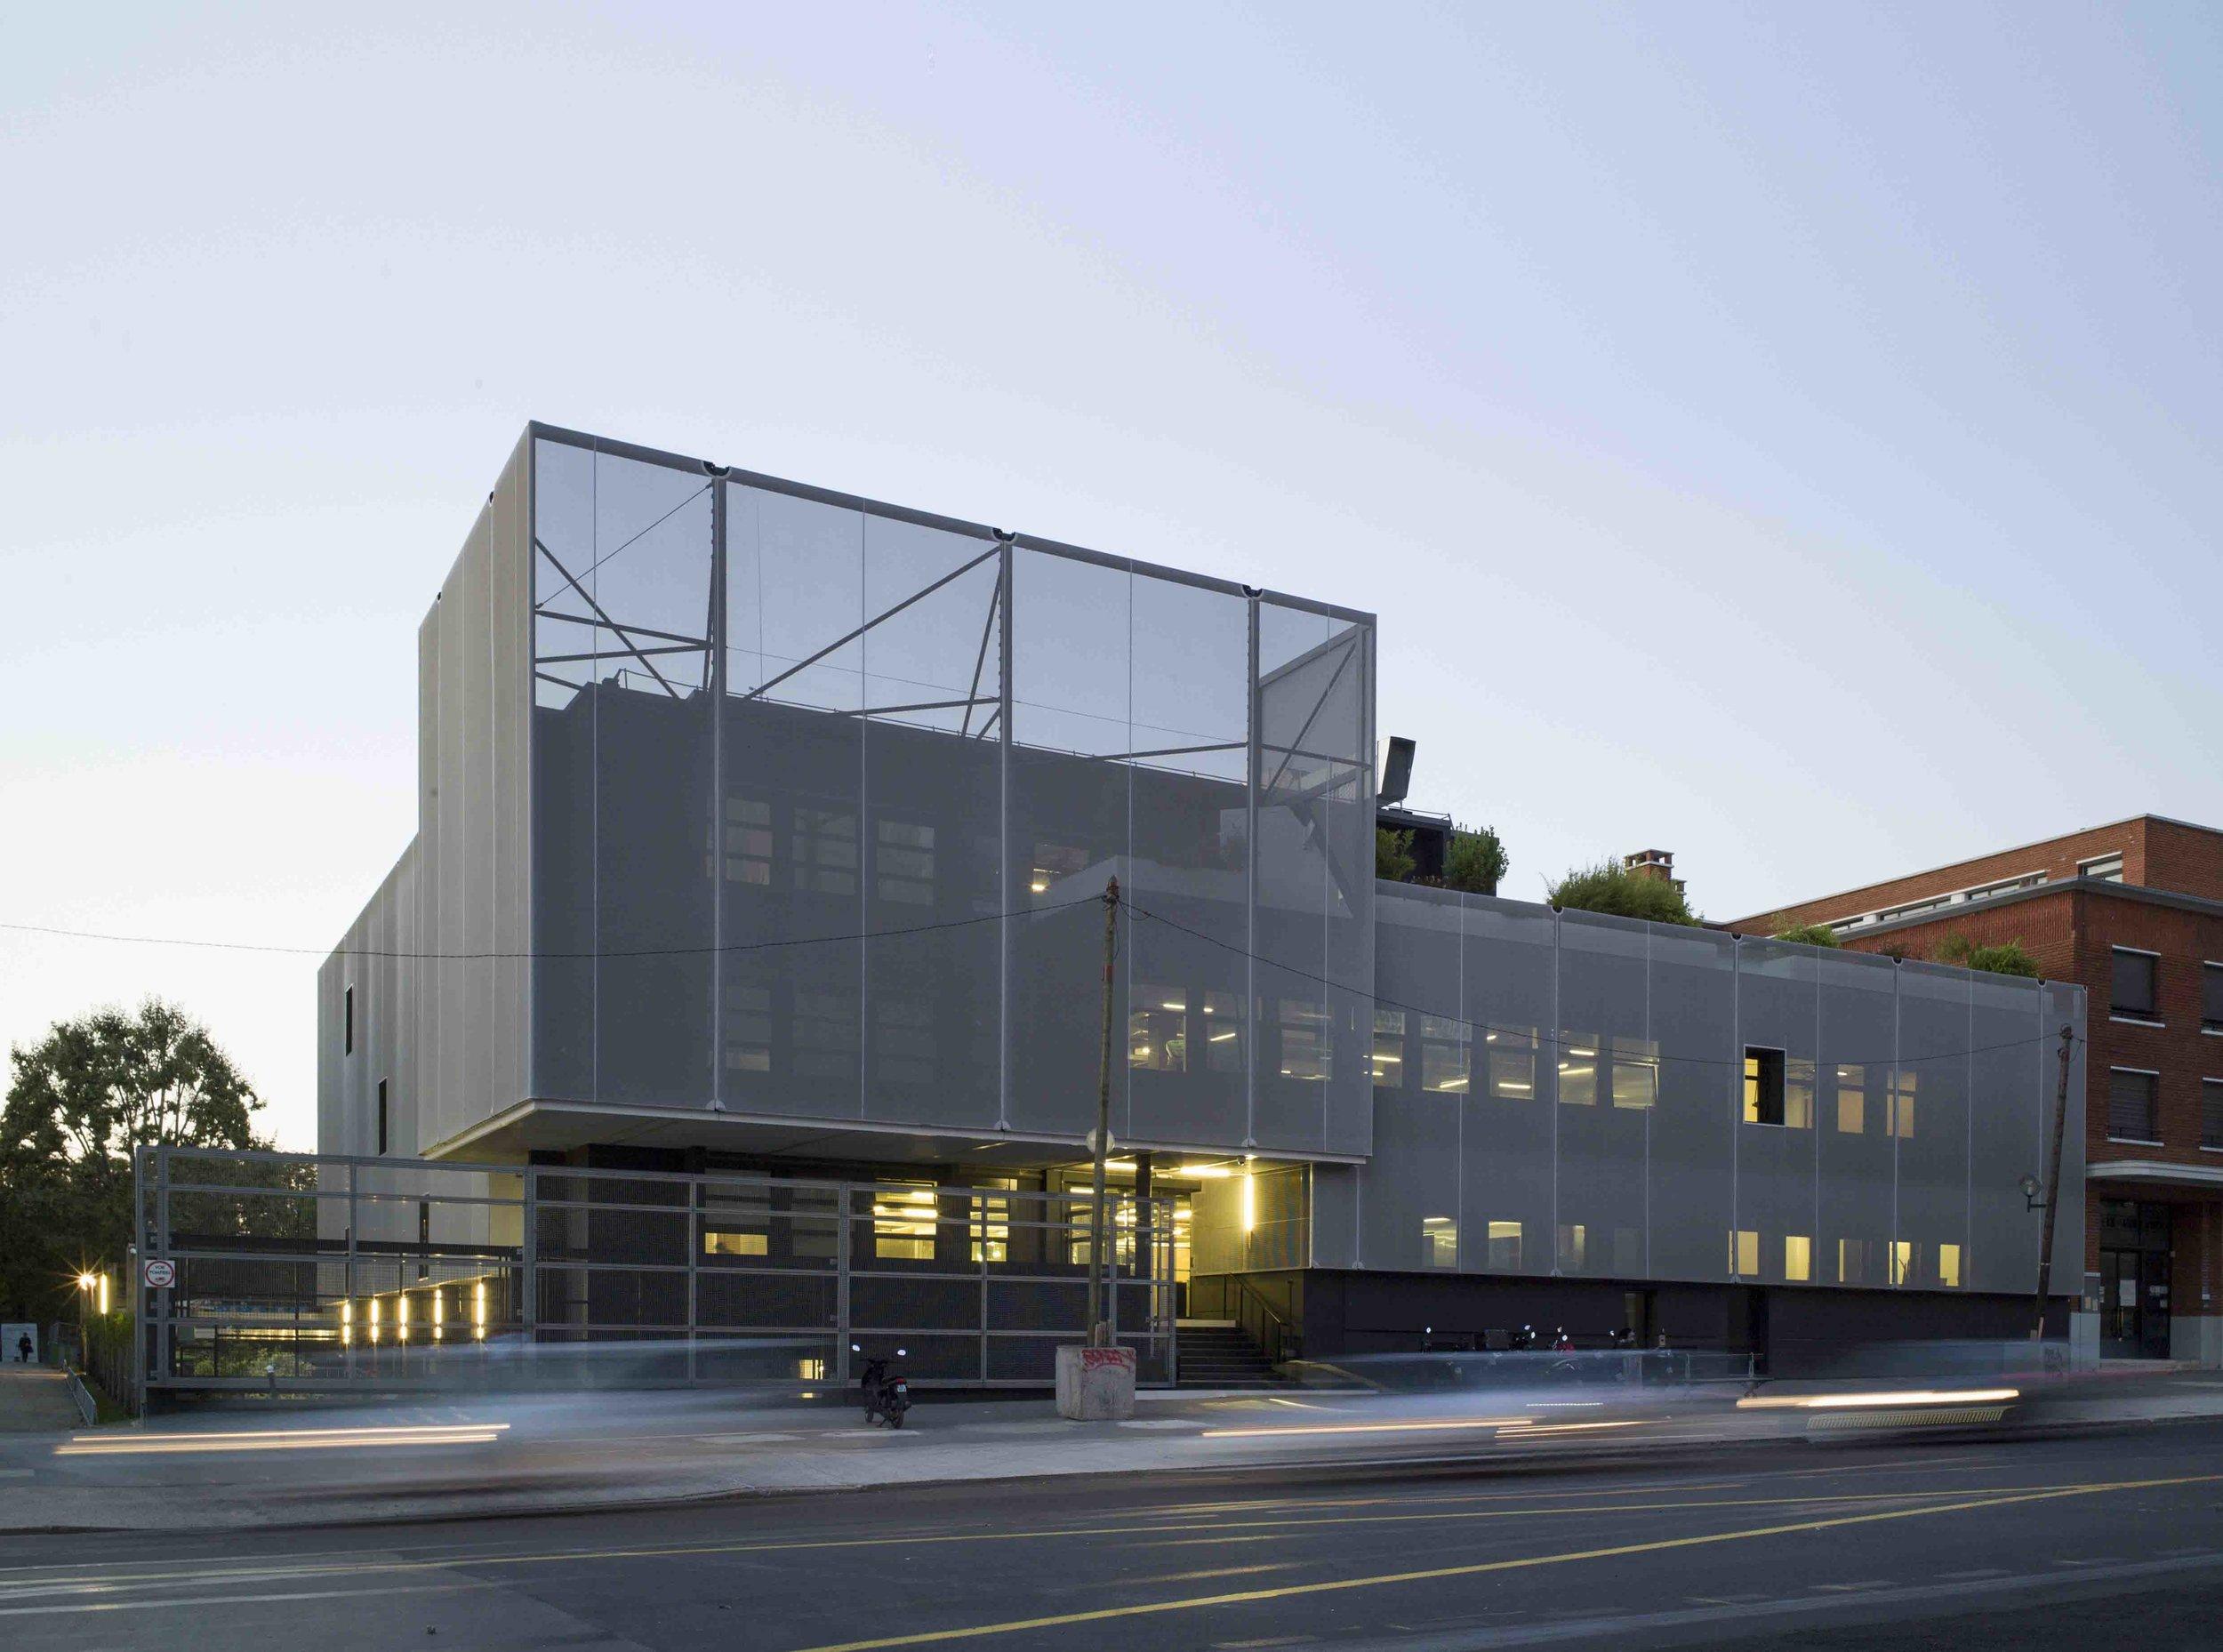 Ecole 42 - NOC 42 - AR Studio Architectures - Xavier NIEL - Kwame YAMGNANE - Florian BUCHER - Nicolas SADIRAC - Free - Reinventer Paris (1).jpg